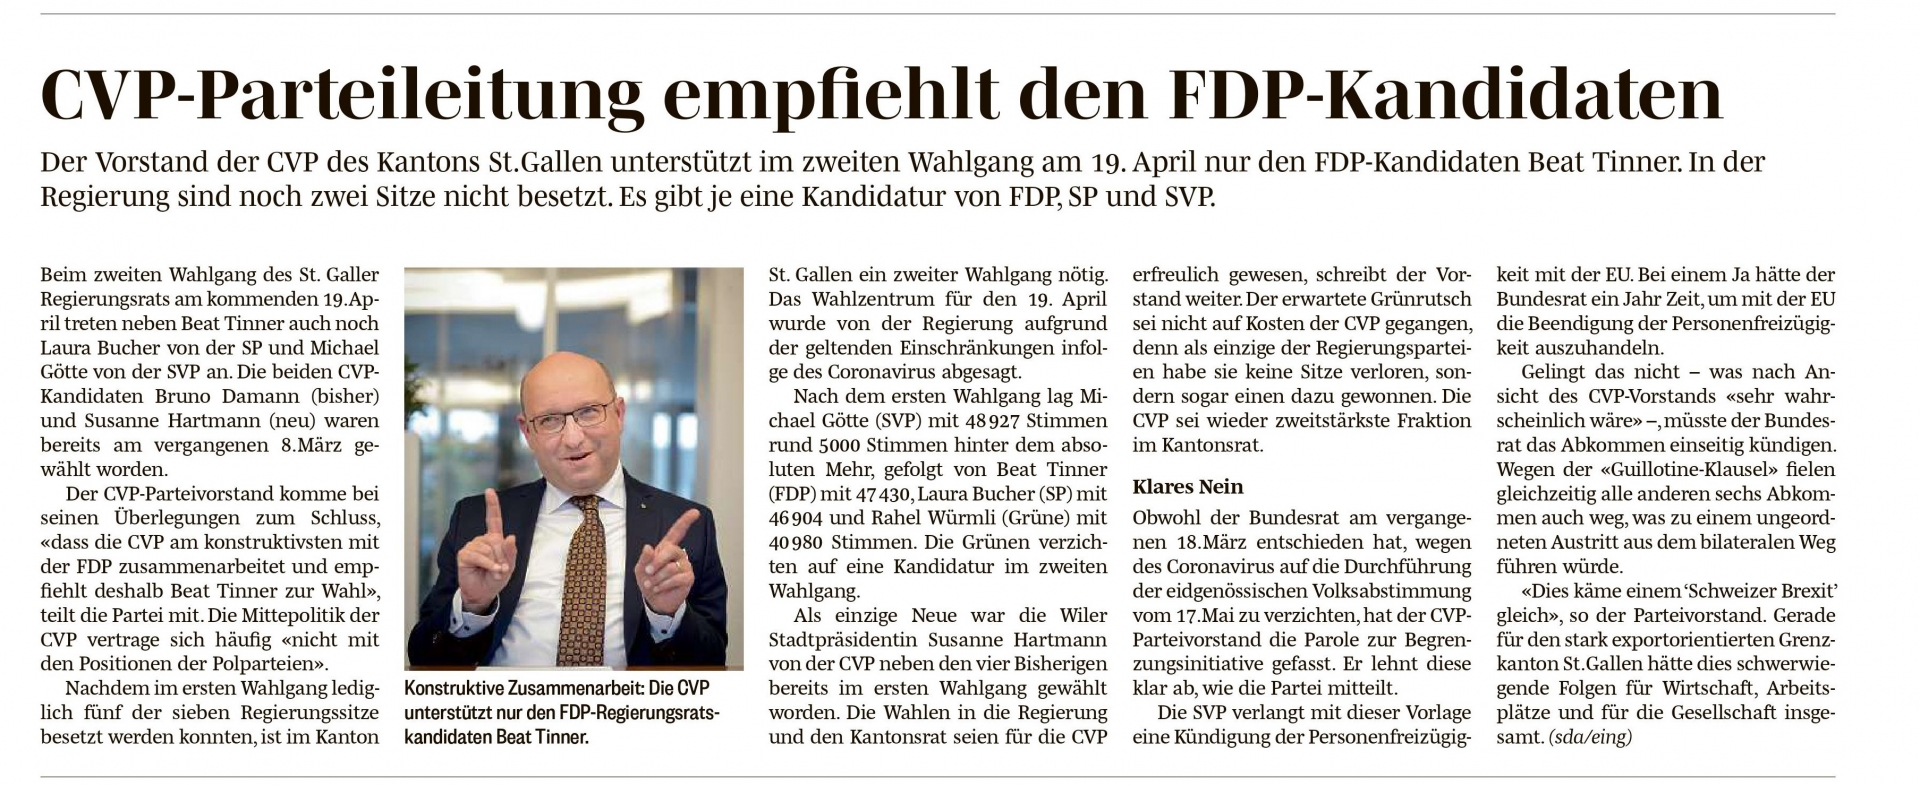 CVP-Parteileitung empfiehlt den FDP-Kandidaten